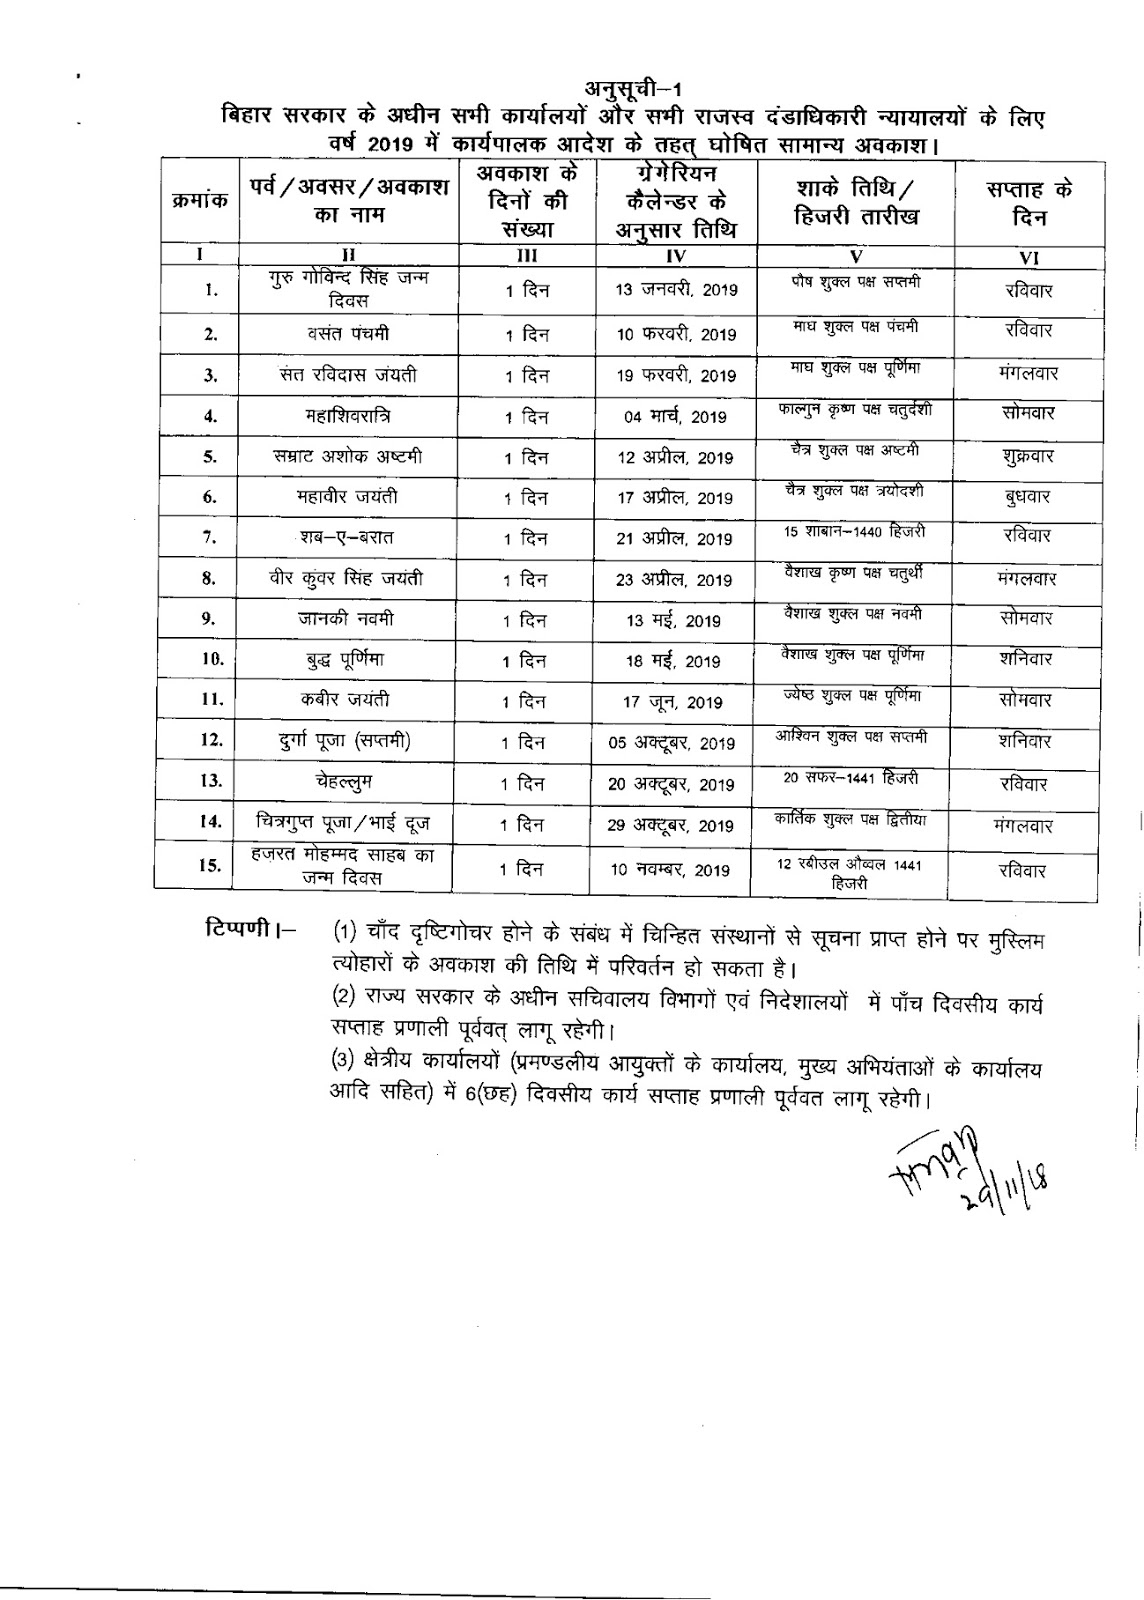 Bihar Government Calendar 2019 #educratsweb for Bihar Sarkar Callender